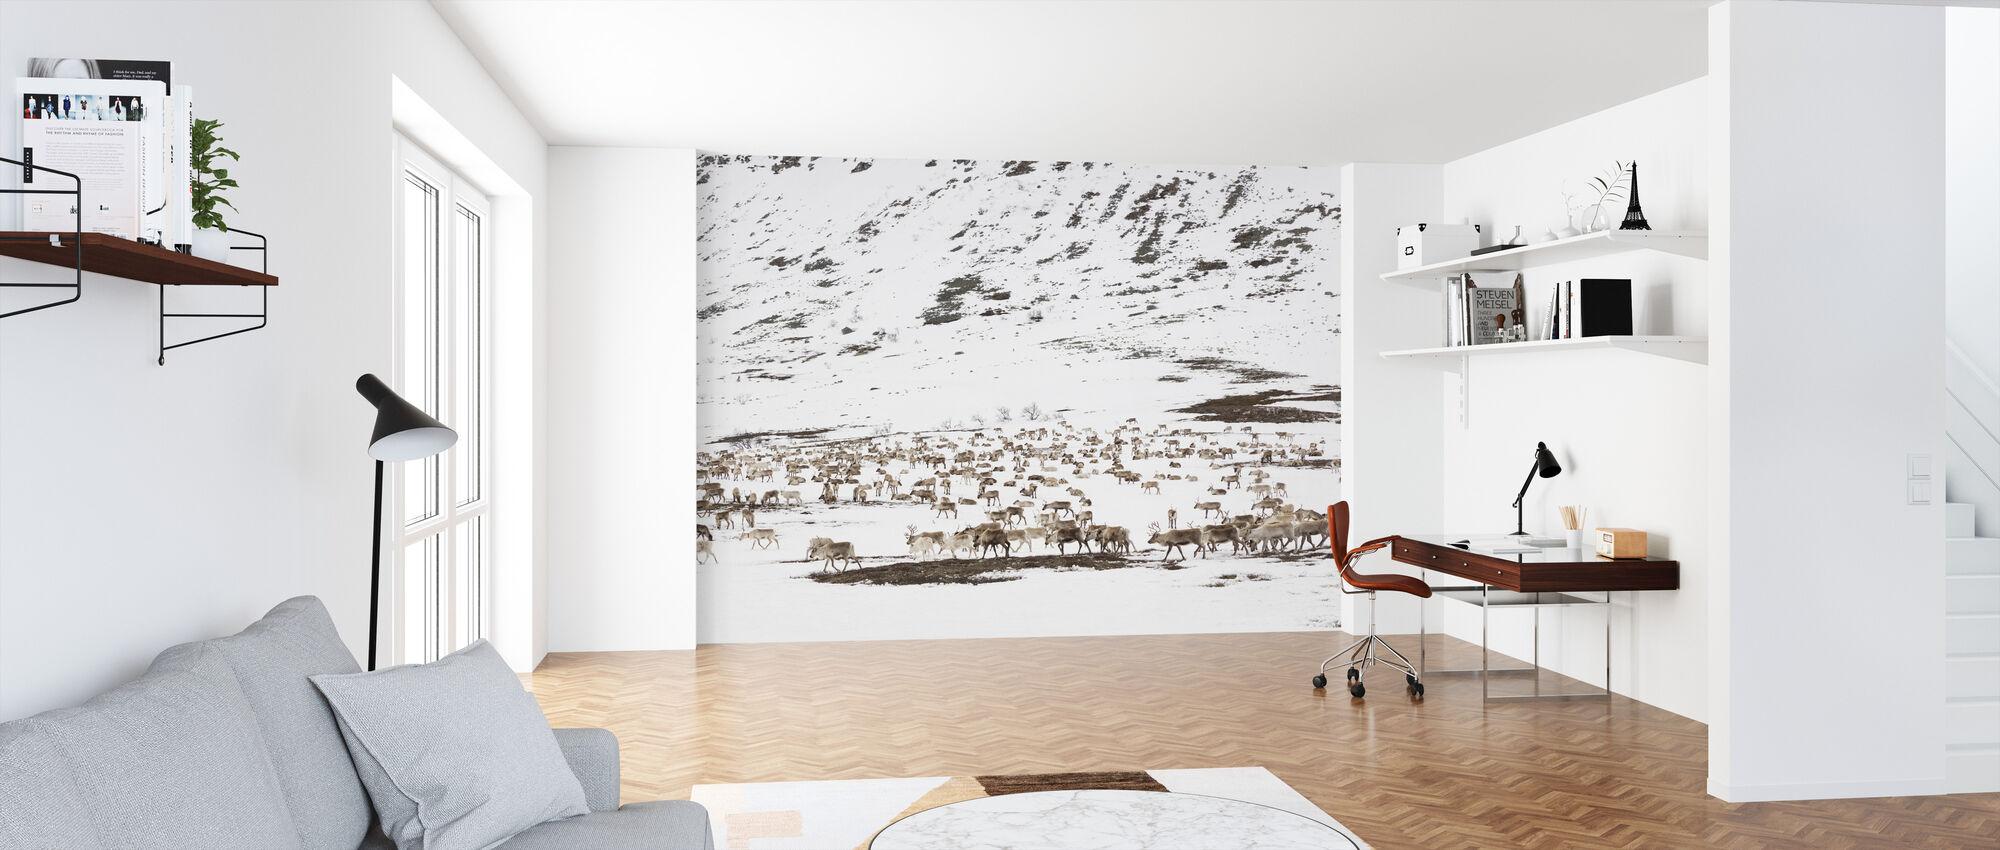 Renar i vinterlandskapet - Tapet - Kontor